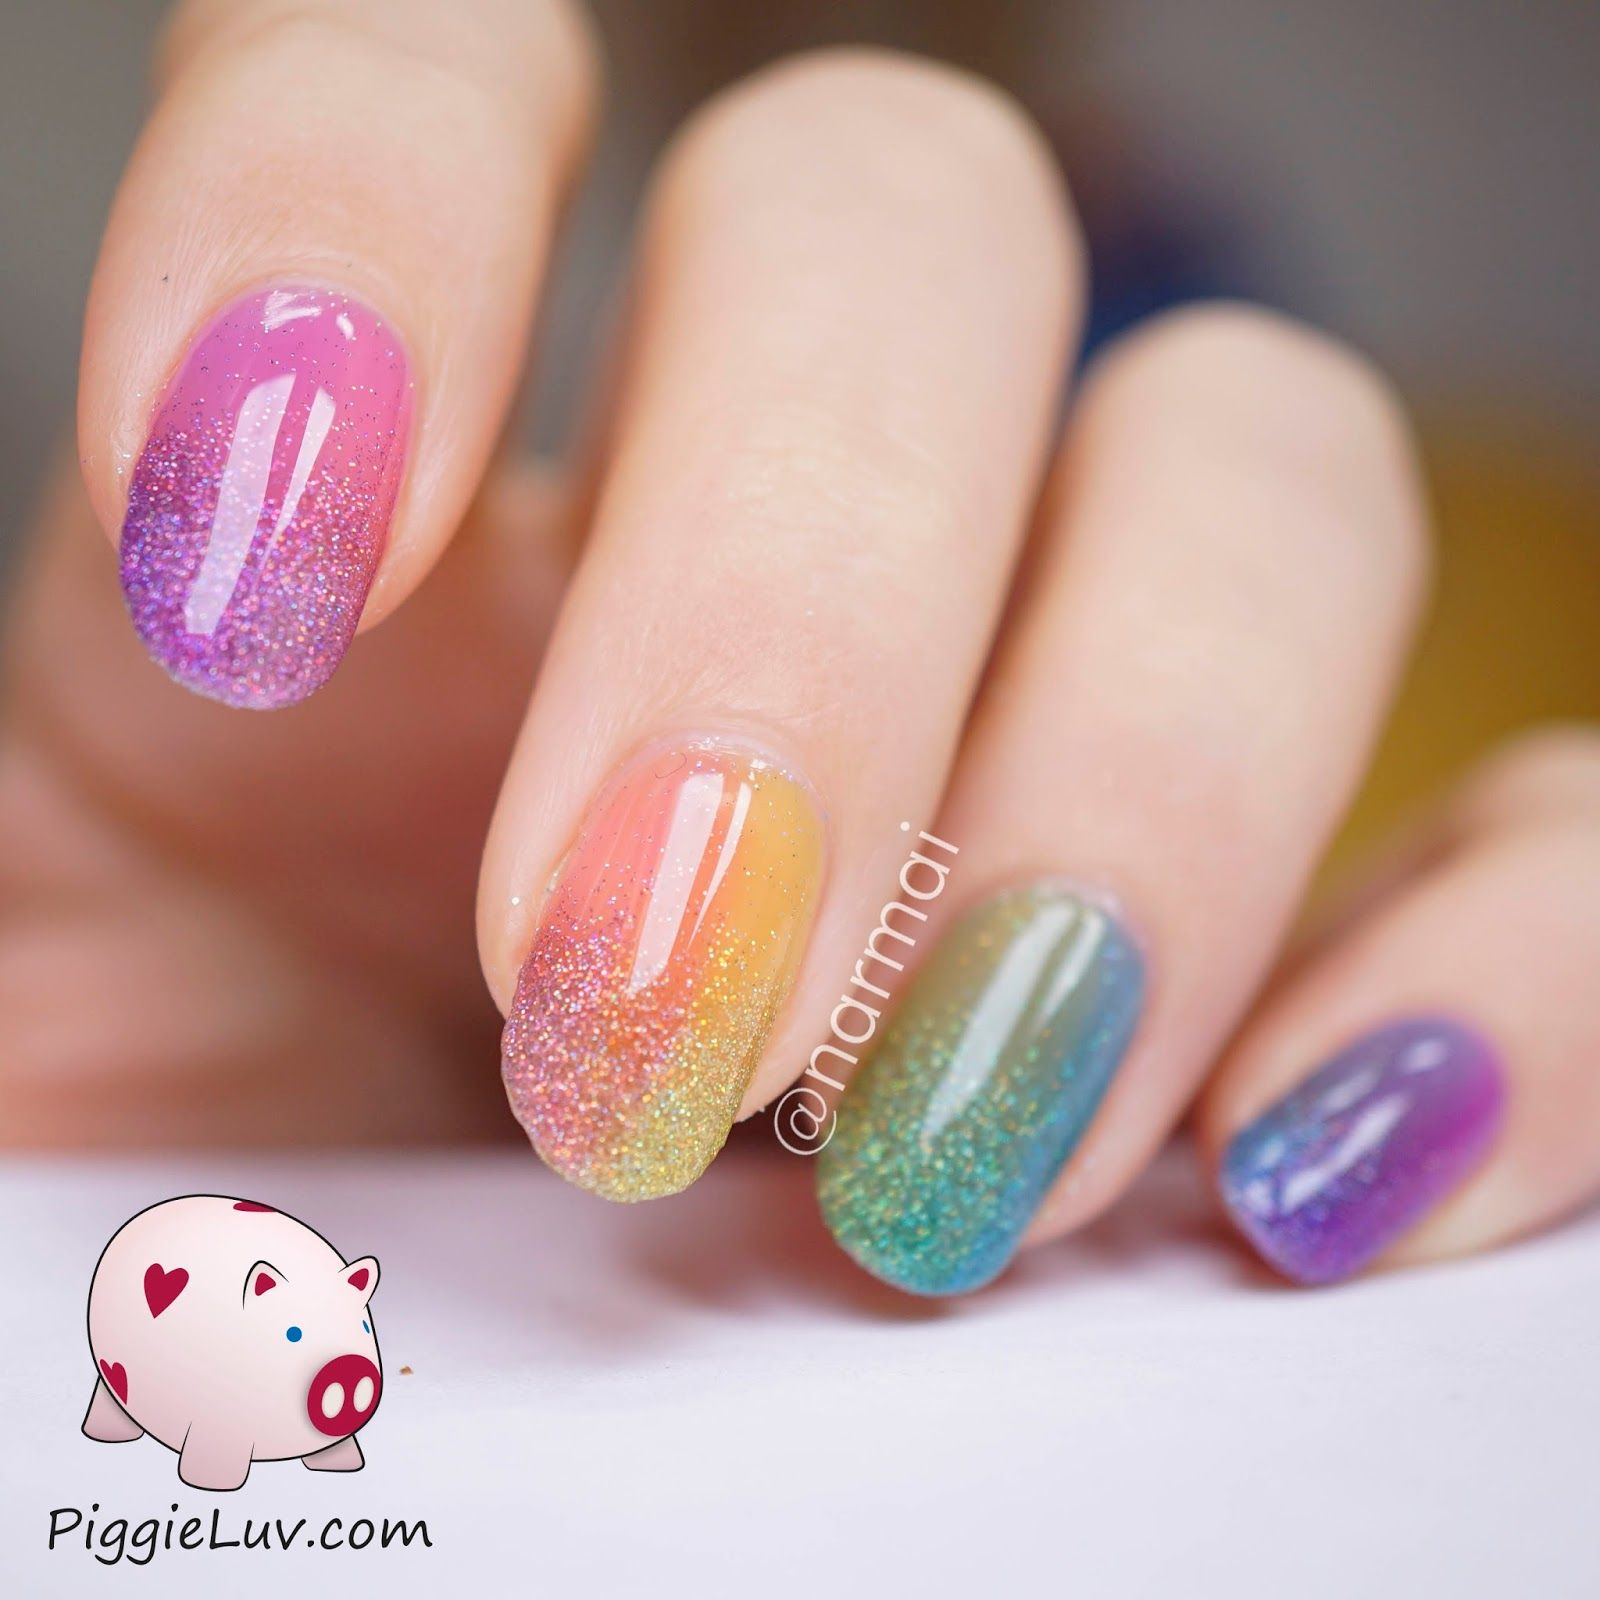 Piggieluv Rainbow Bubbles Nail Art: Double Gradient Glitter Rainbow Nail Art With OPI Sheer